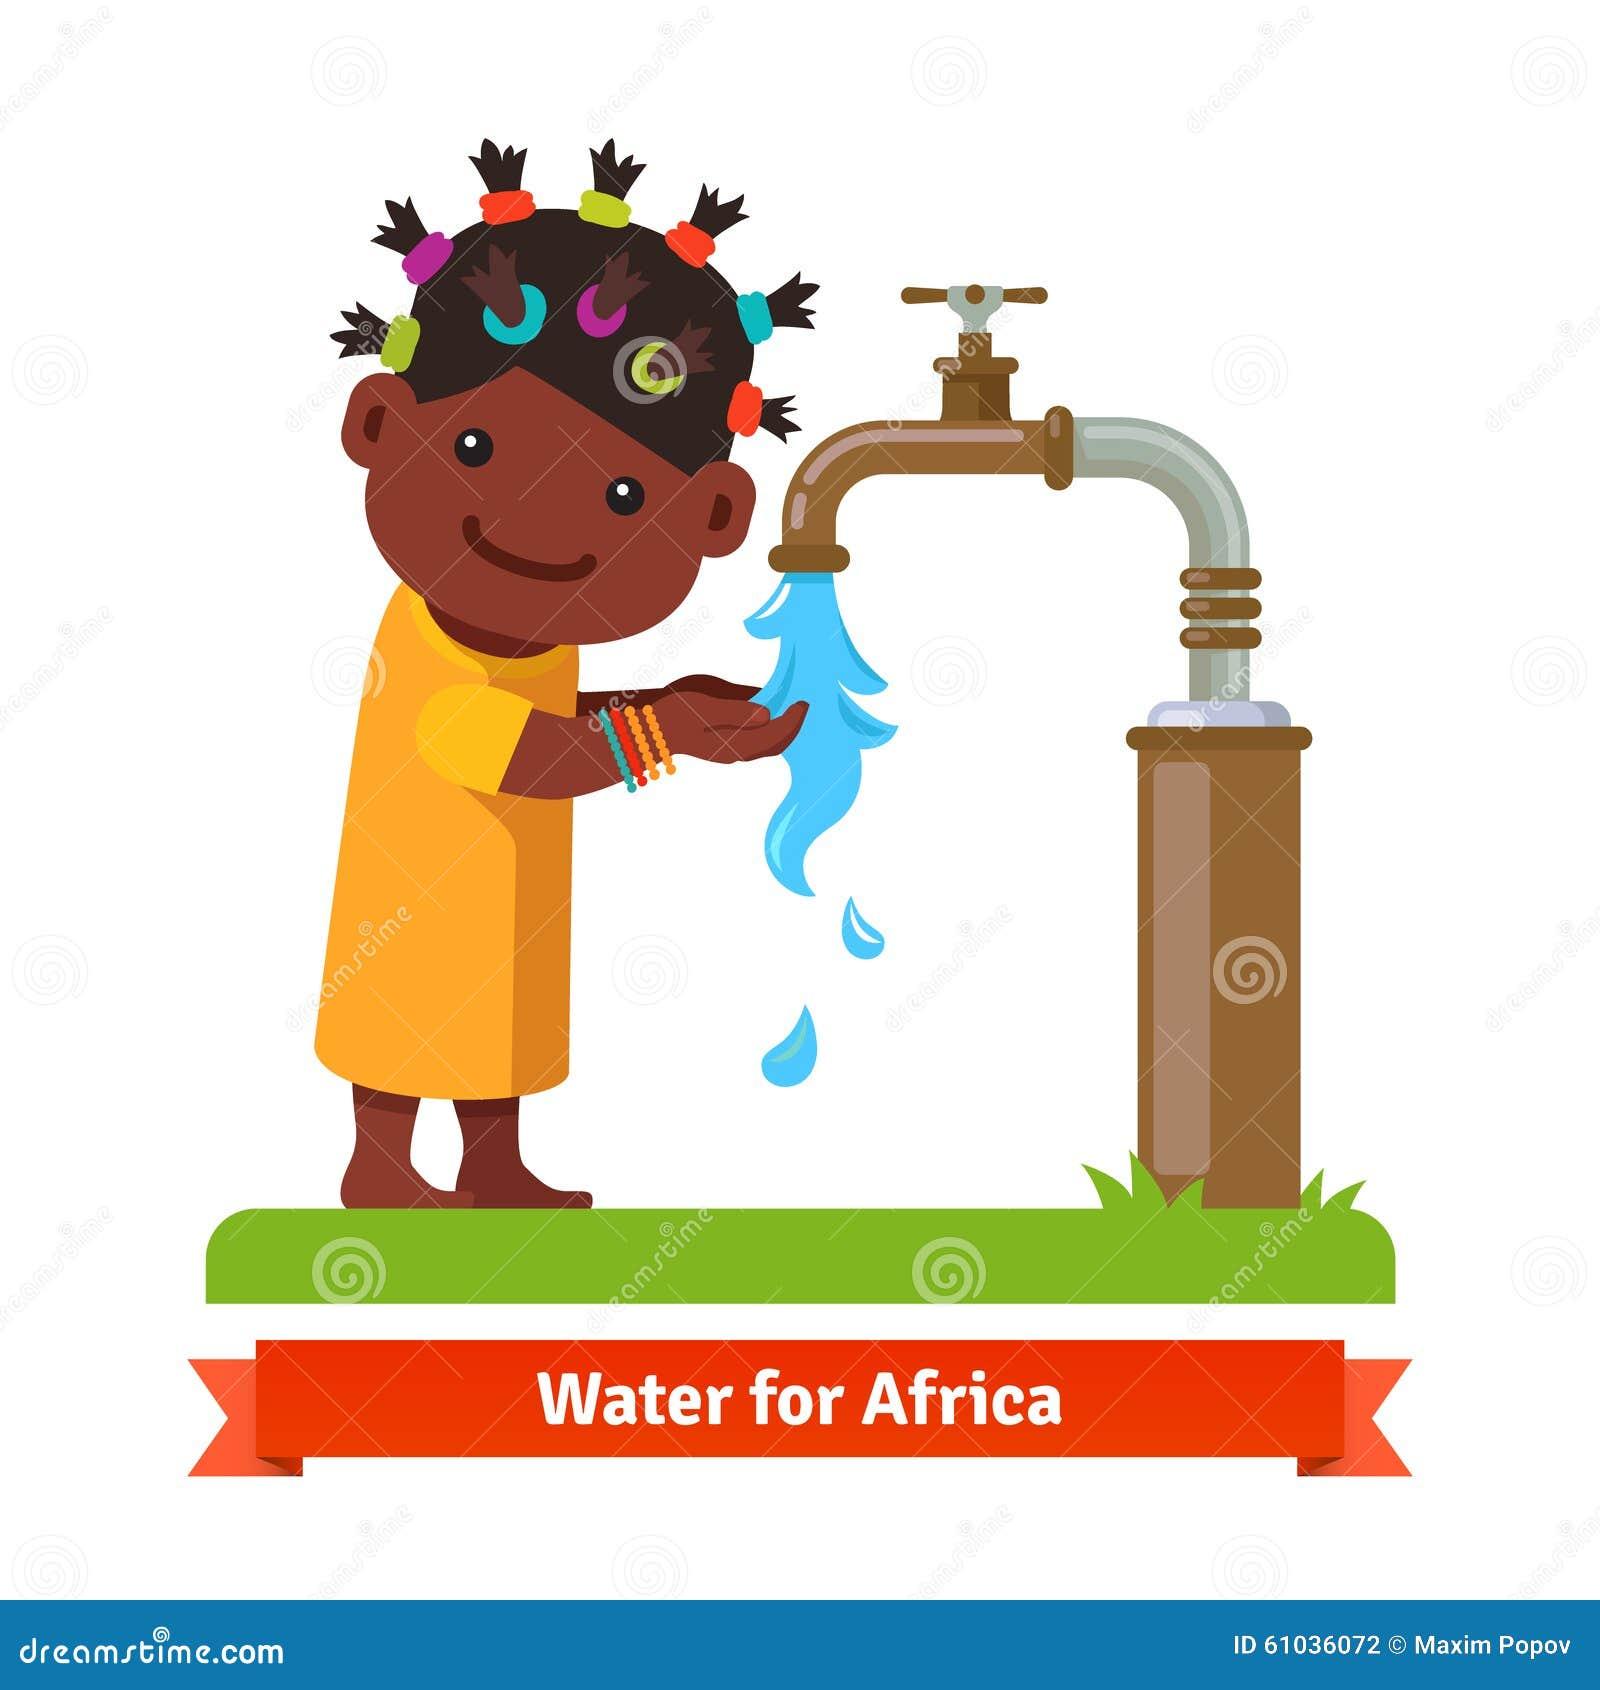 Drinking Water Faucet >> Girl Washing Hands. Water Shortage Symbol Stock Vector - Image: 61036072